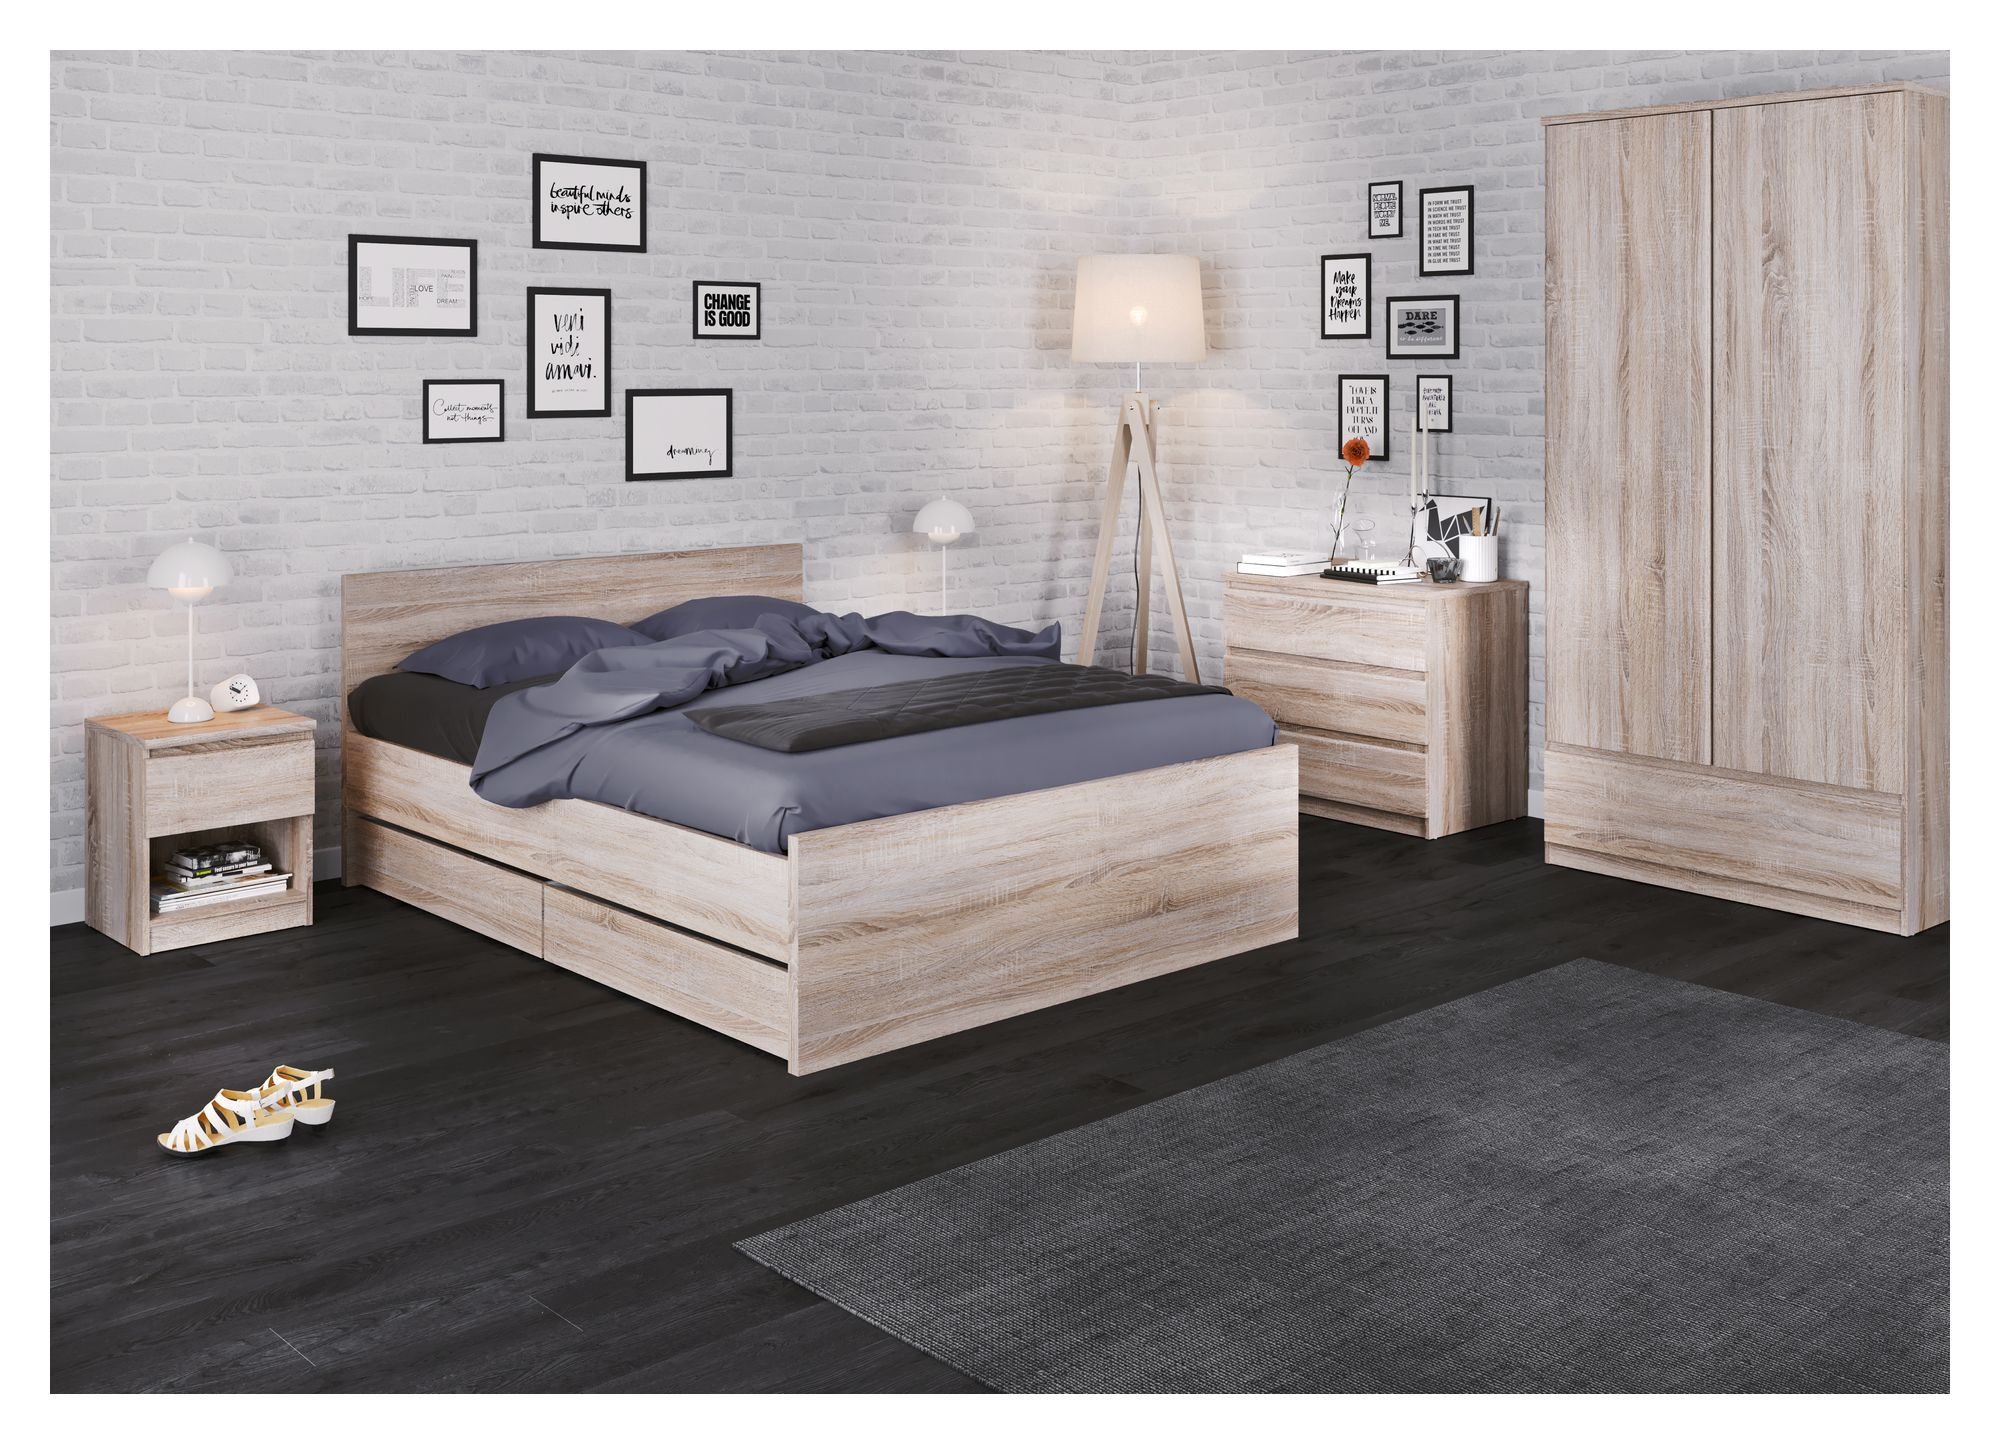 Naia Sengebord - Mørk træ - Sengebord i trøffelfarve m skuffe